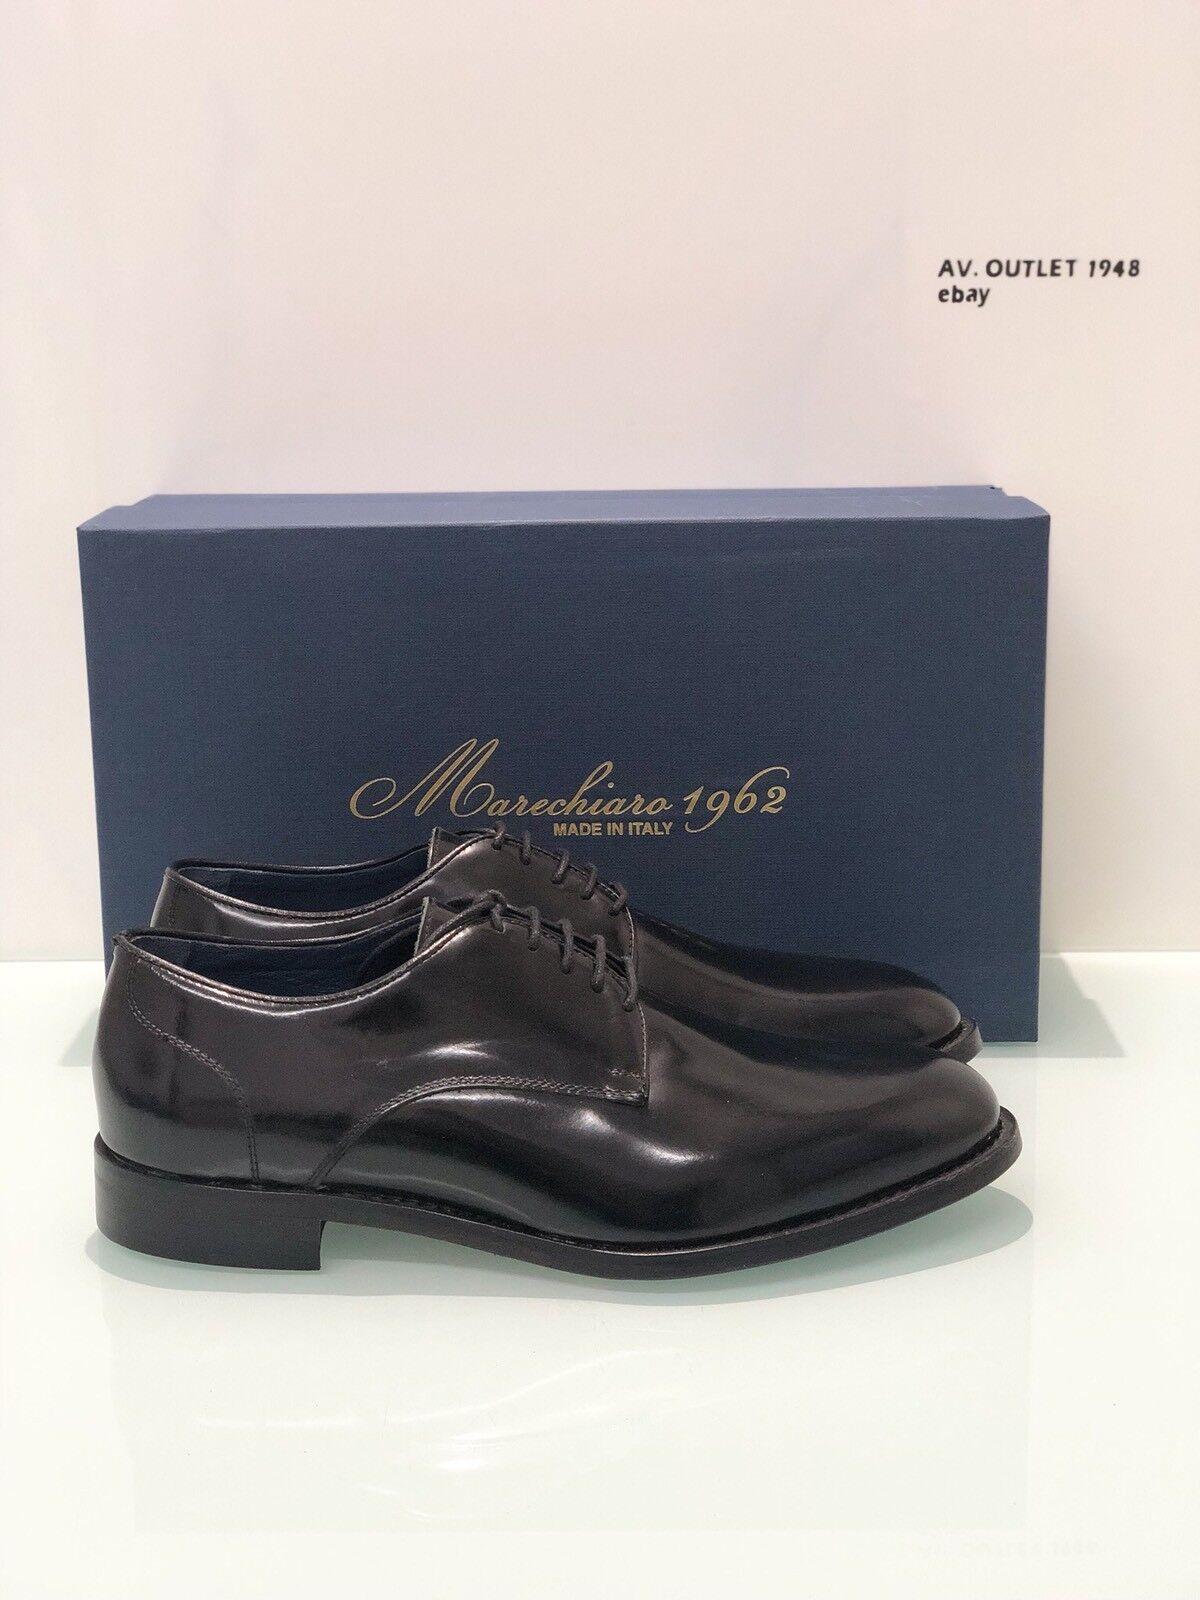 Derby Leather Black Marechiaro 1962 Man Model 5143 Size 40 Made IN